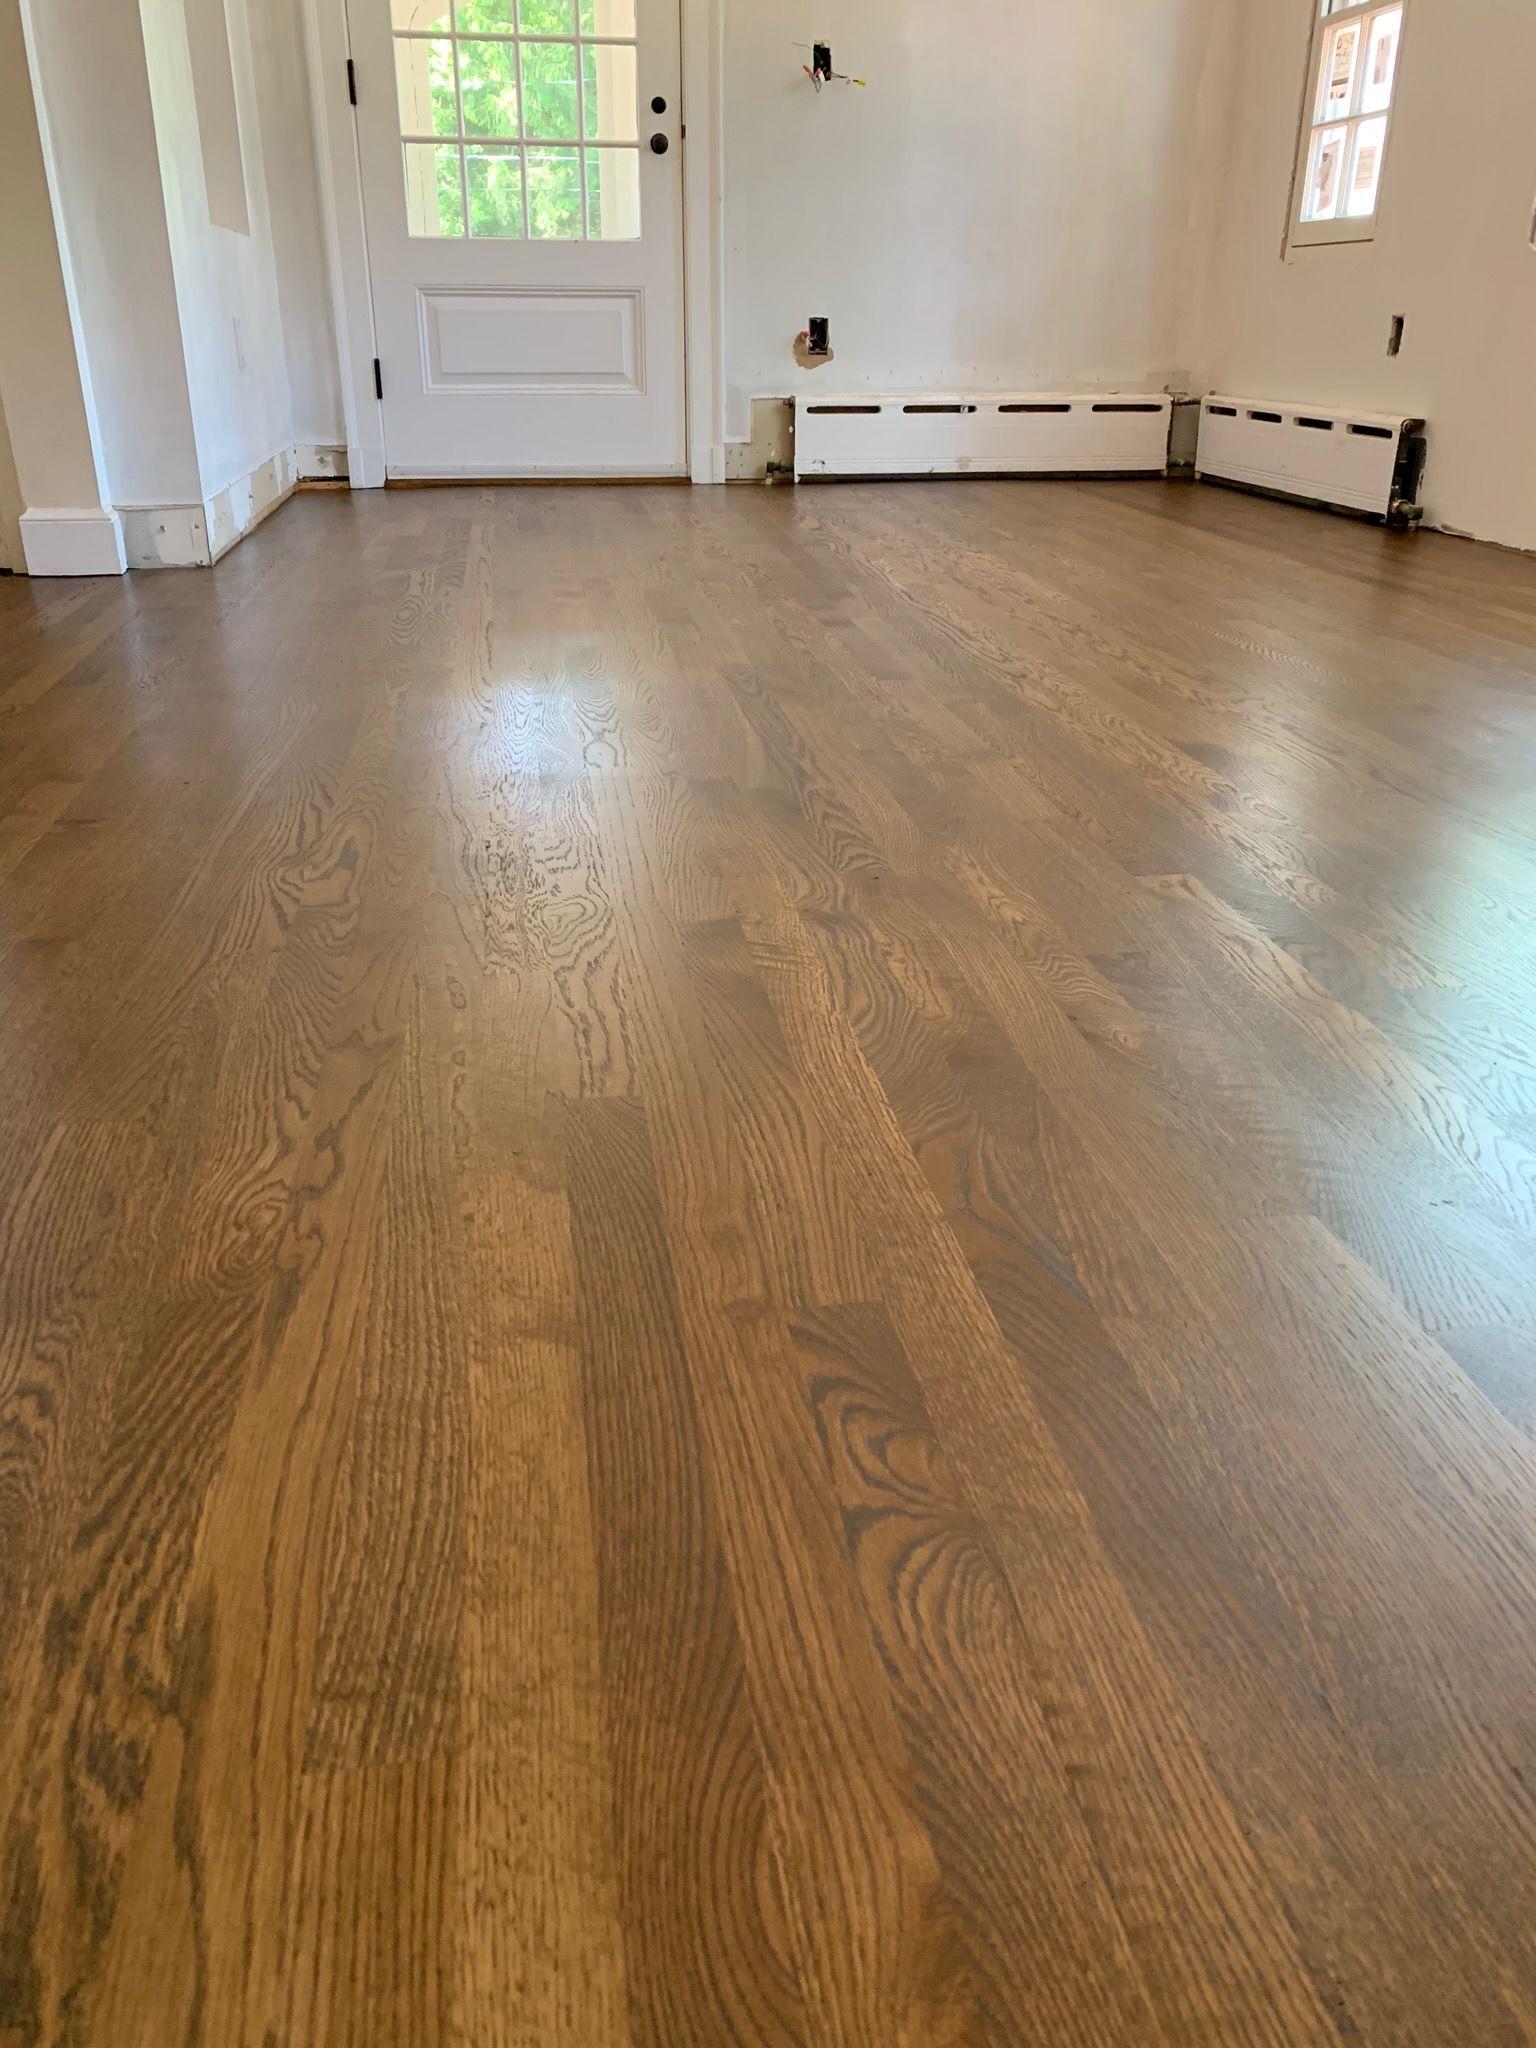 Bona Antique Brown Wood Floor Stain Colors Flooring Hardwood Floor Colors